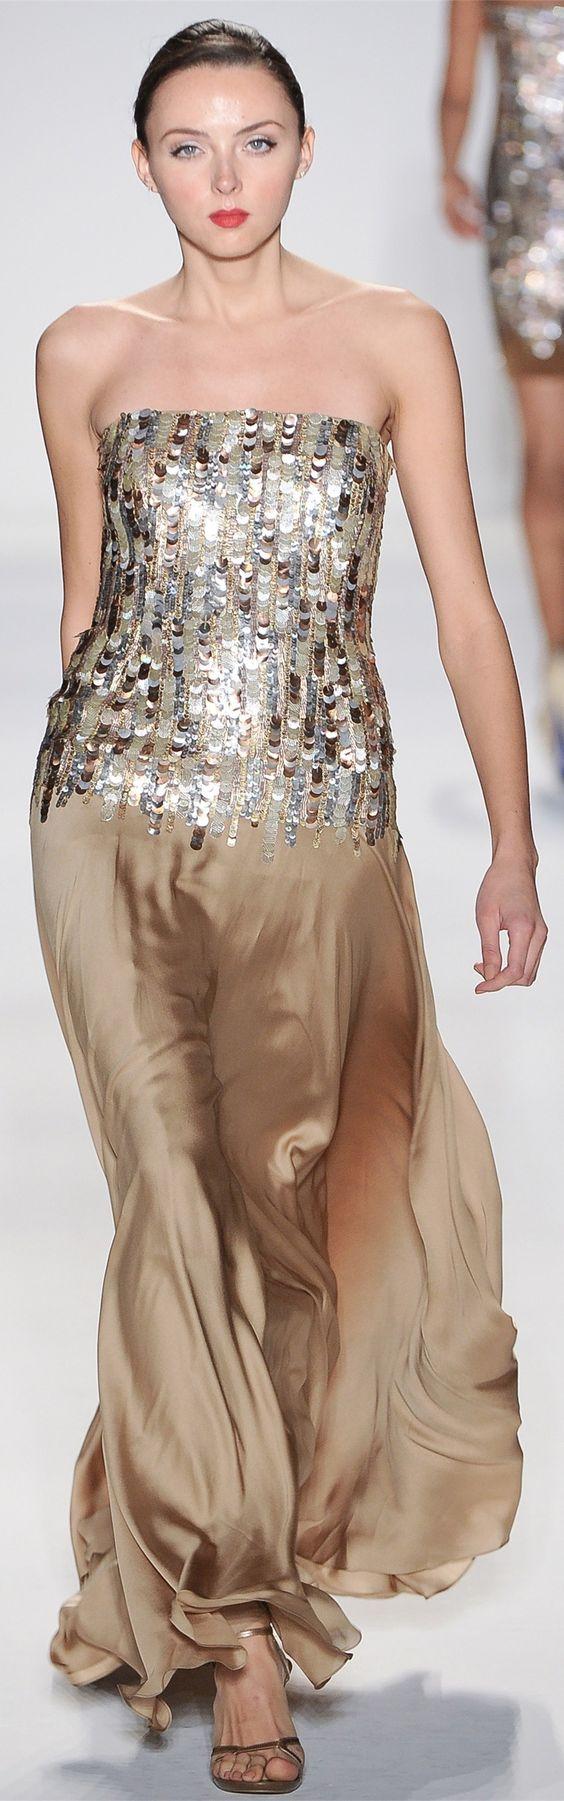 ✜ Farah Angsana 2012 - 2013 ✜ http://www.vogue.ru/collection/fallwinter2012/ready-to-wear/nyu-york/Farah_Angsana/collection/